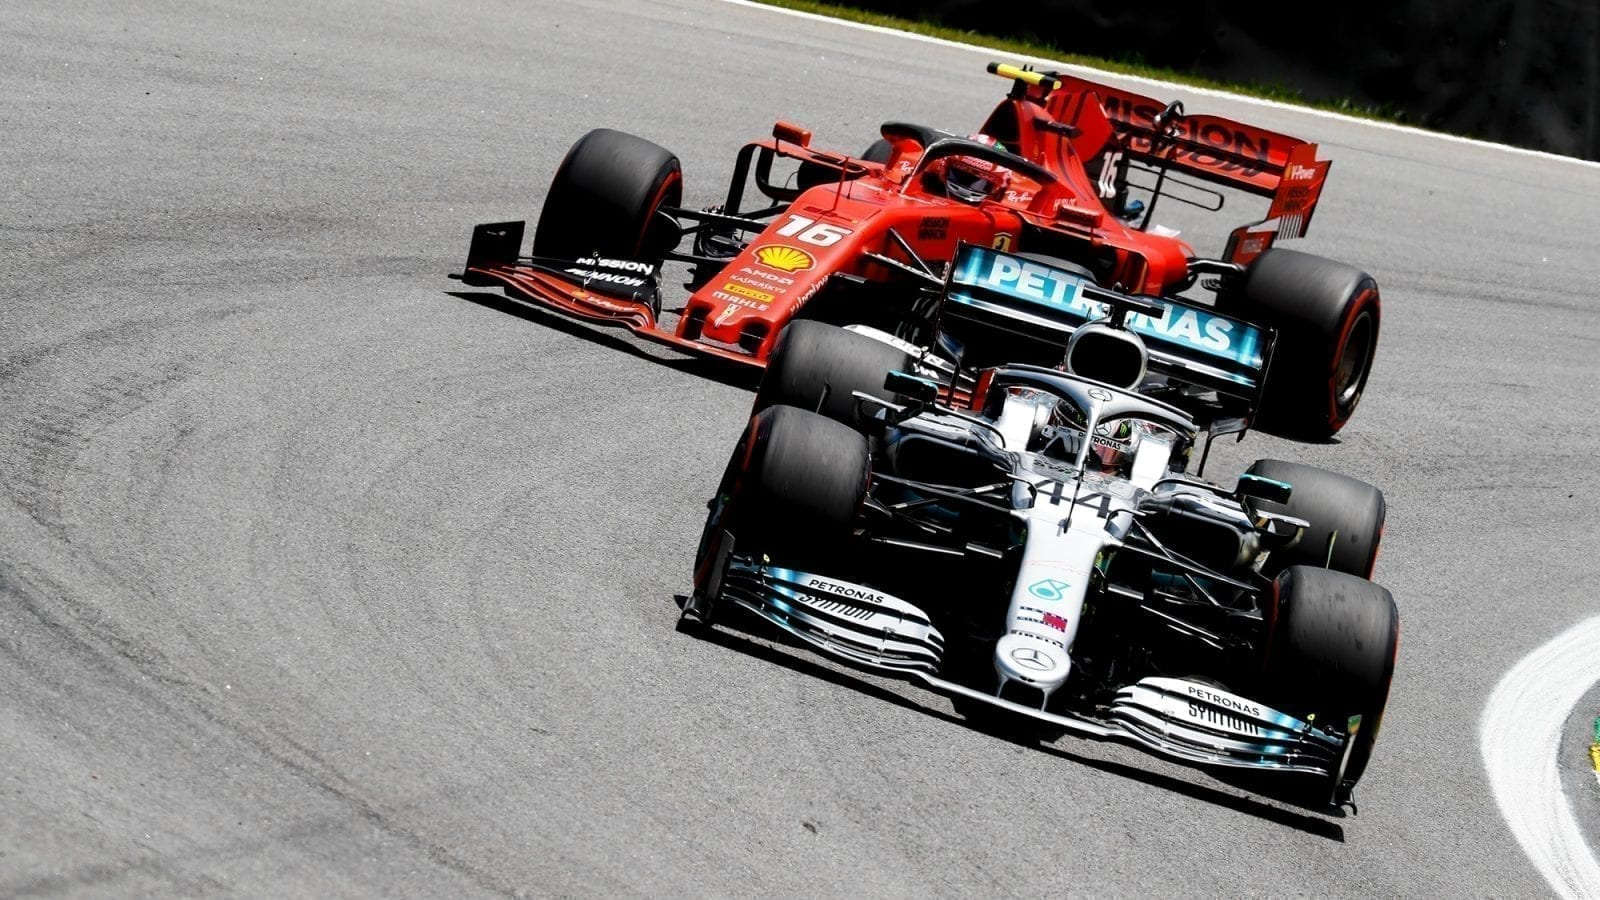 2019 Brazilian Grand Prix Lewis Hamilton and Charles Leclerc